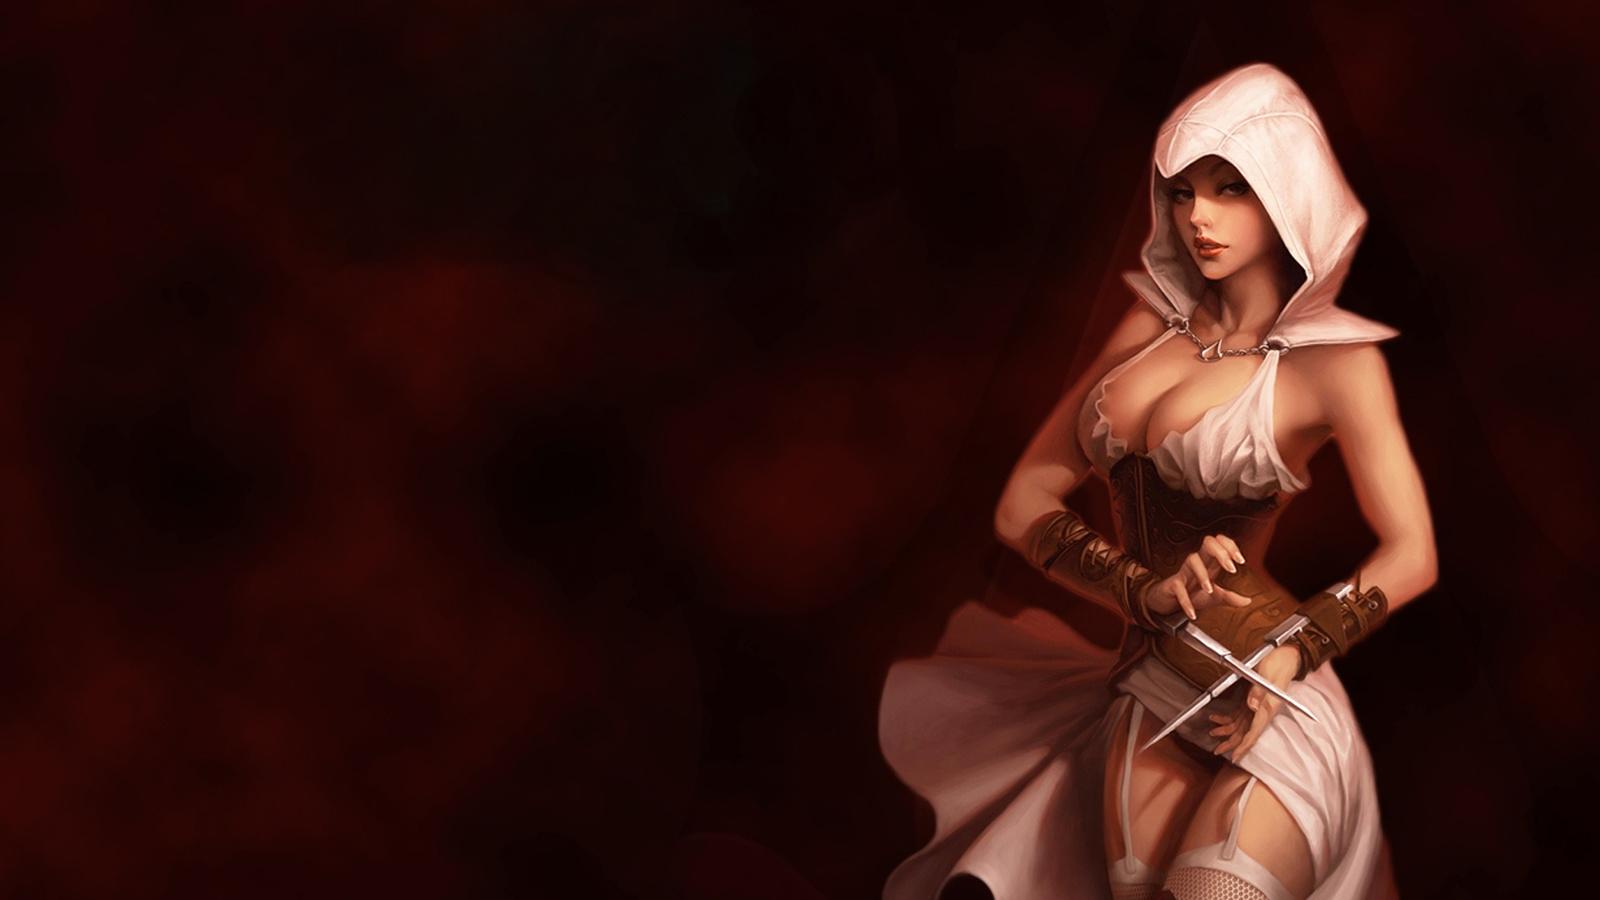 картинки аниме девушки убийцы: